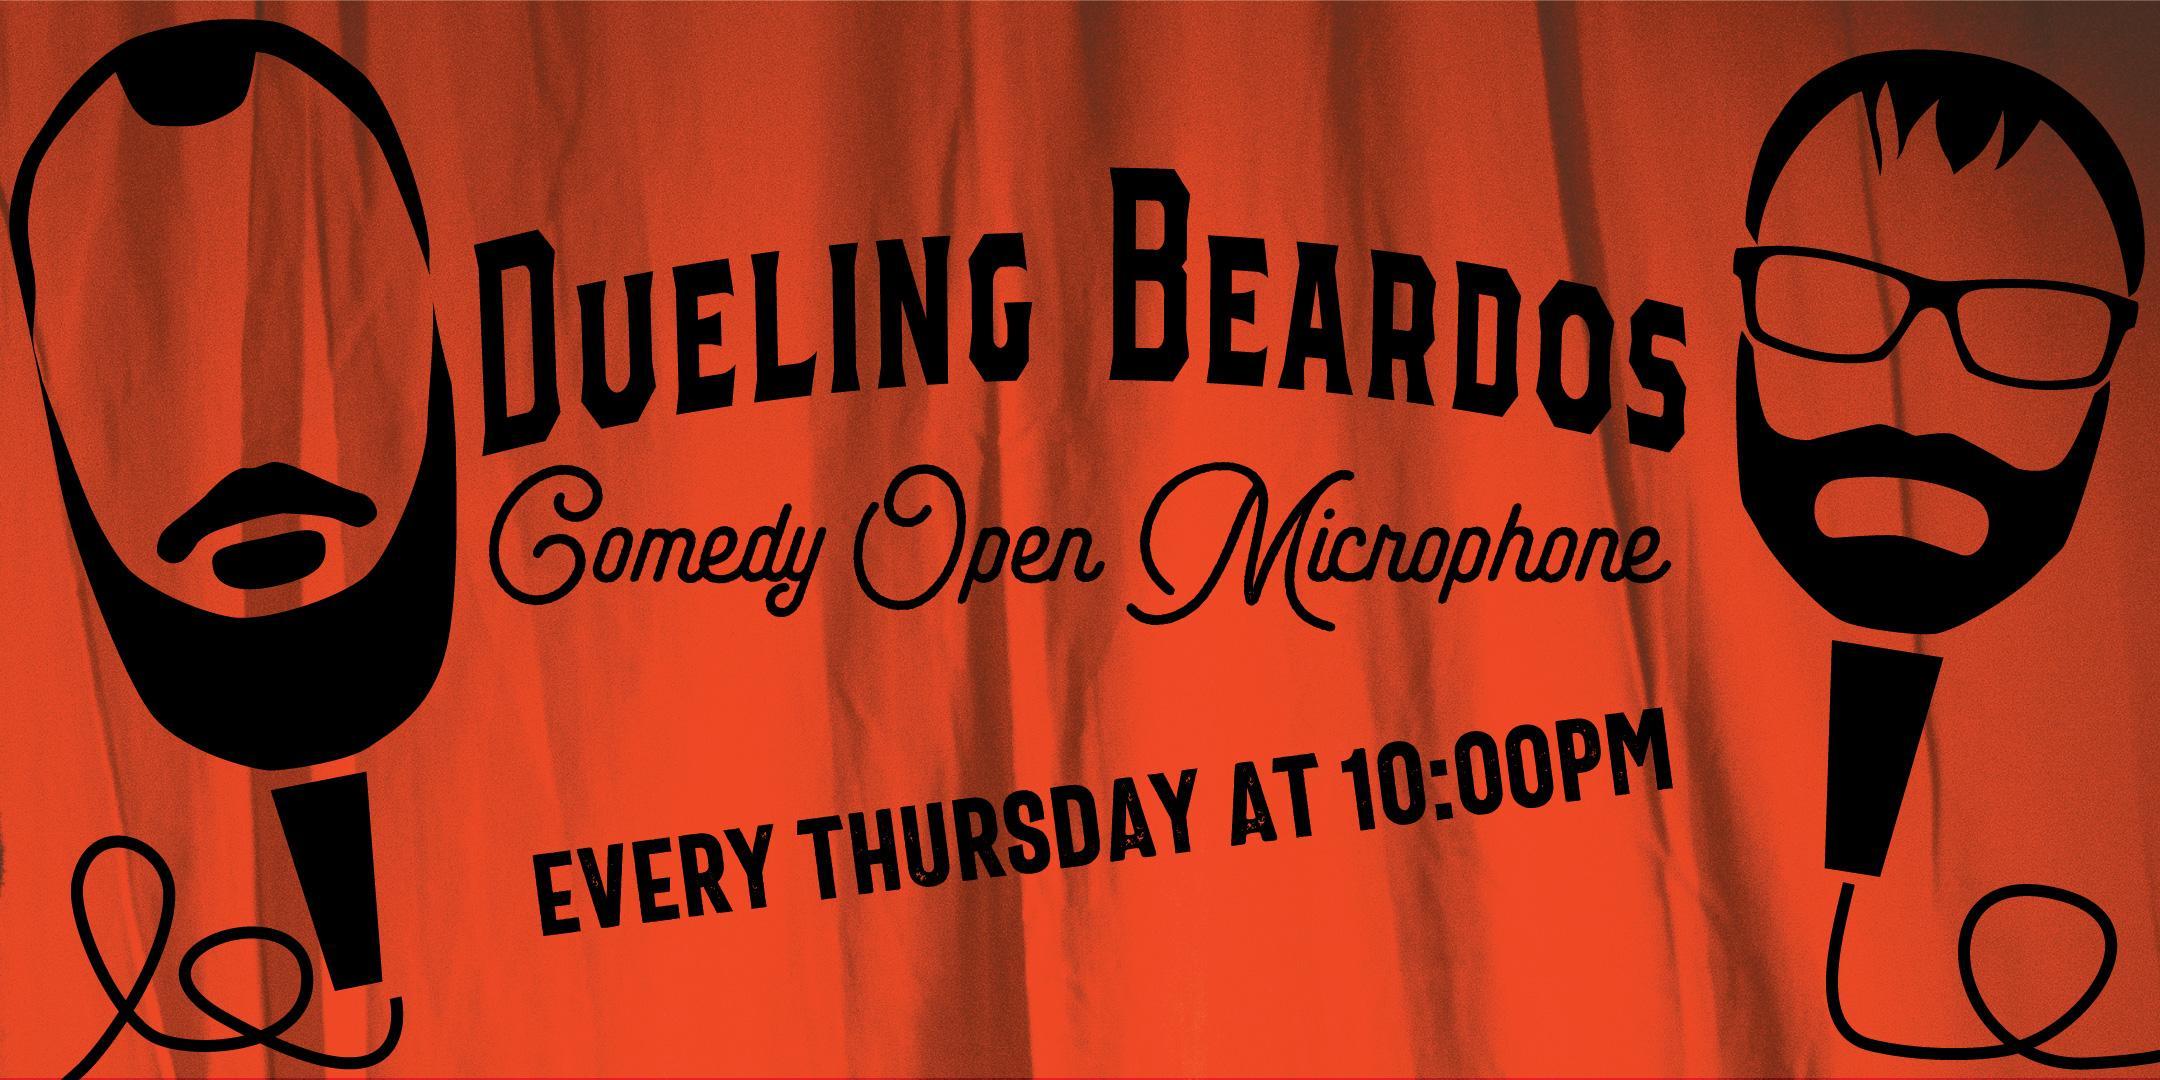 Dueling Beardos Comedy Open Microphone.